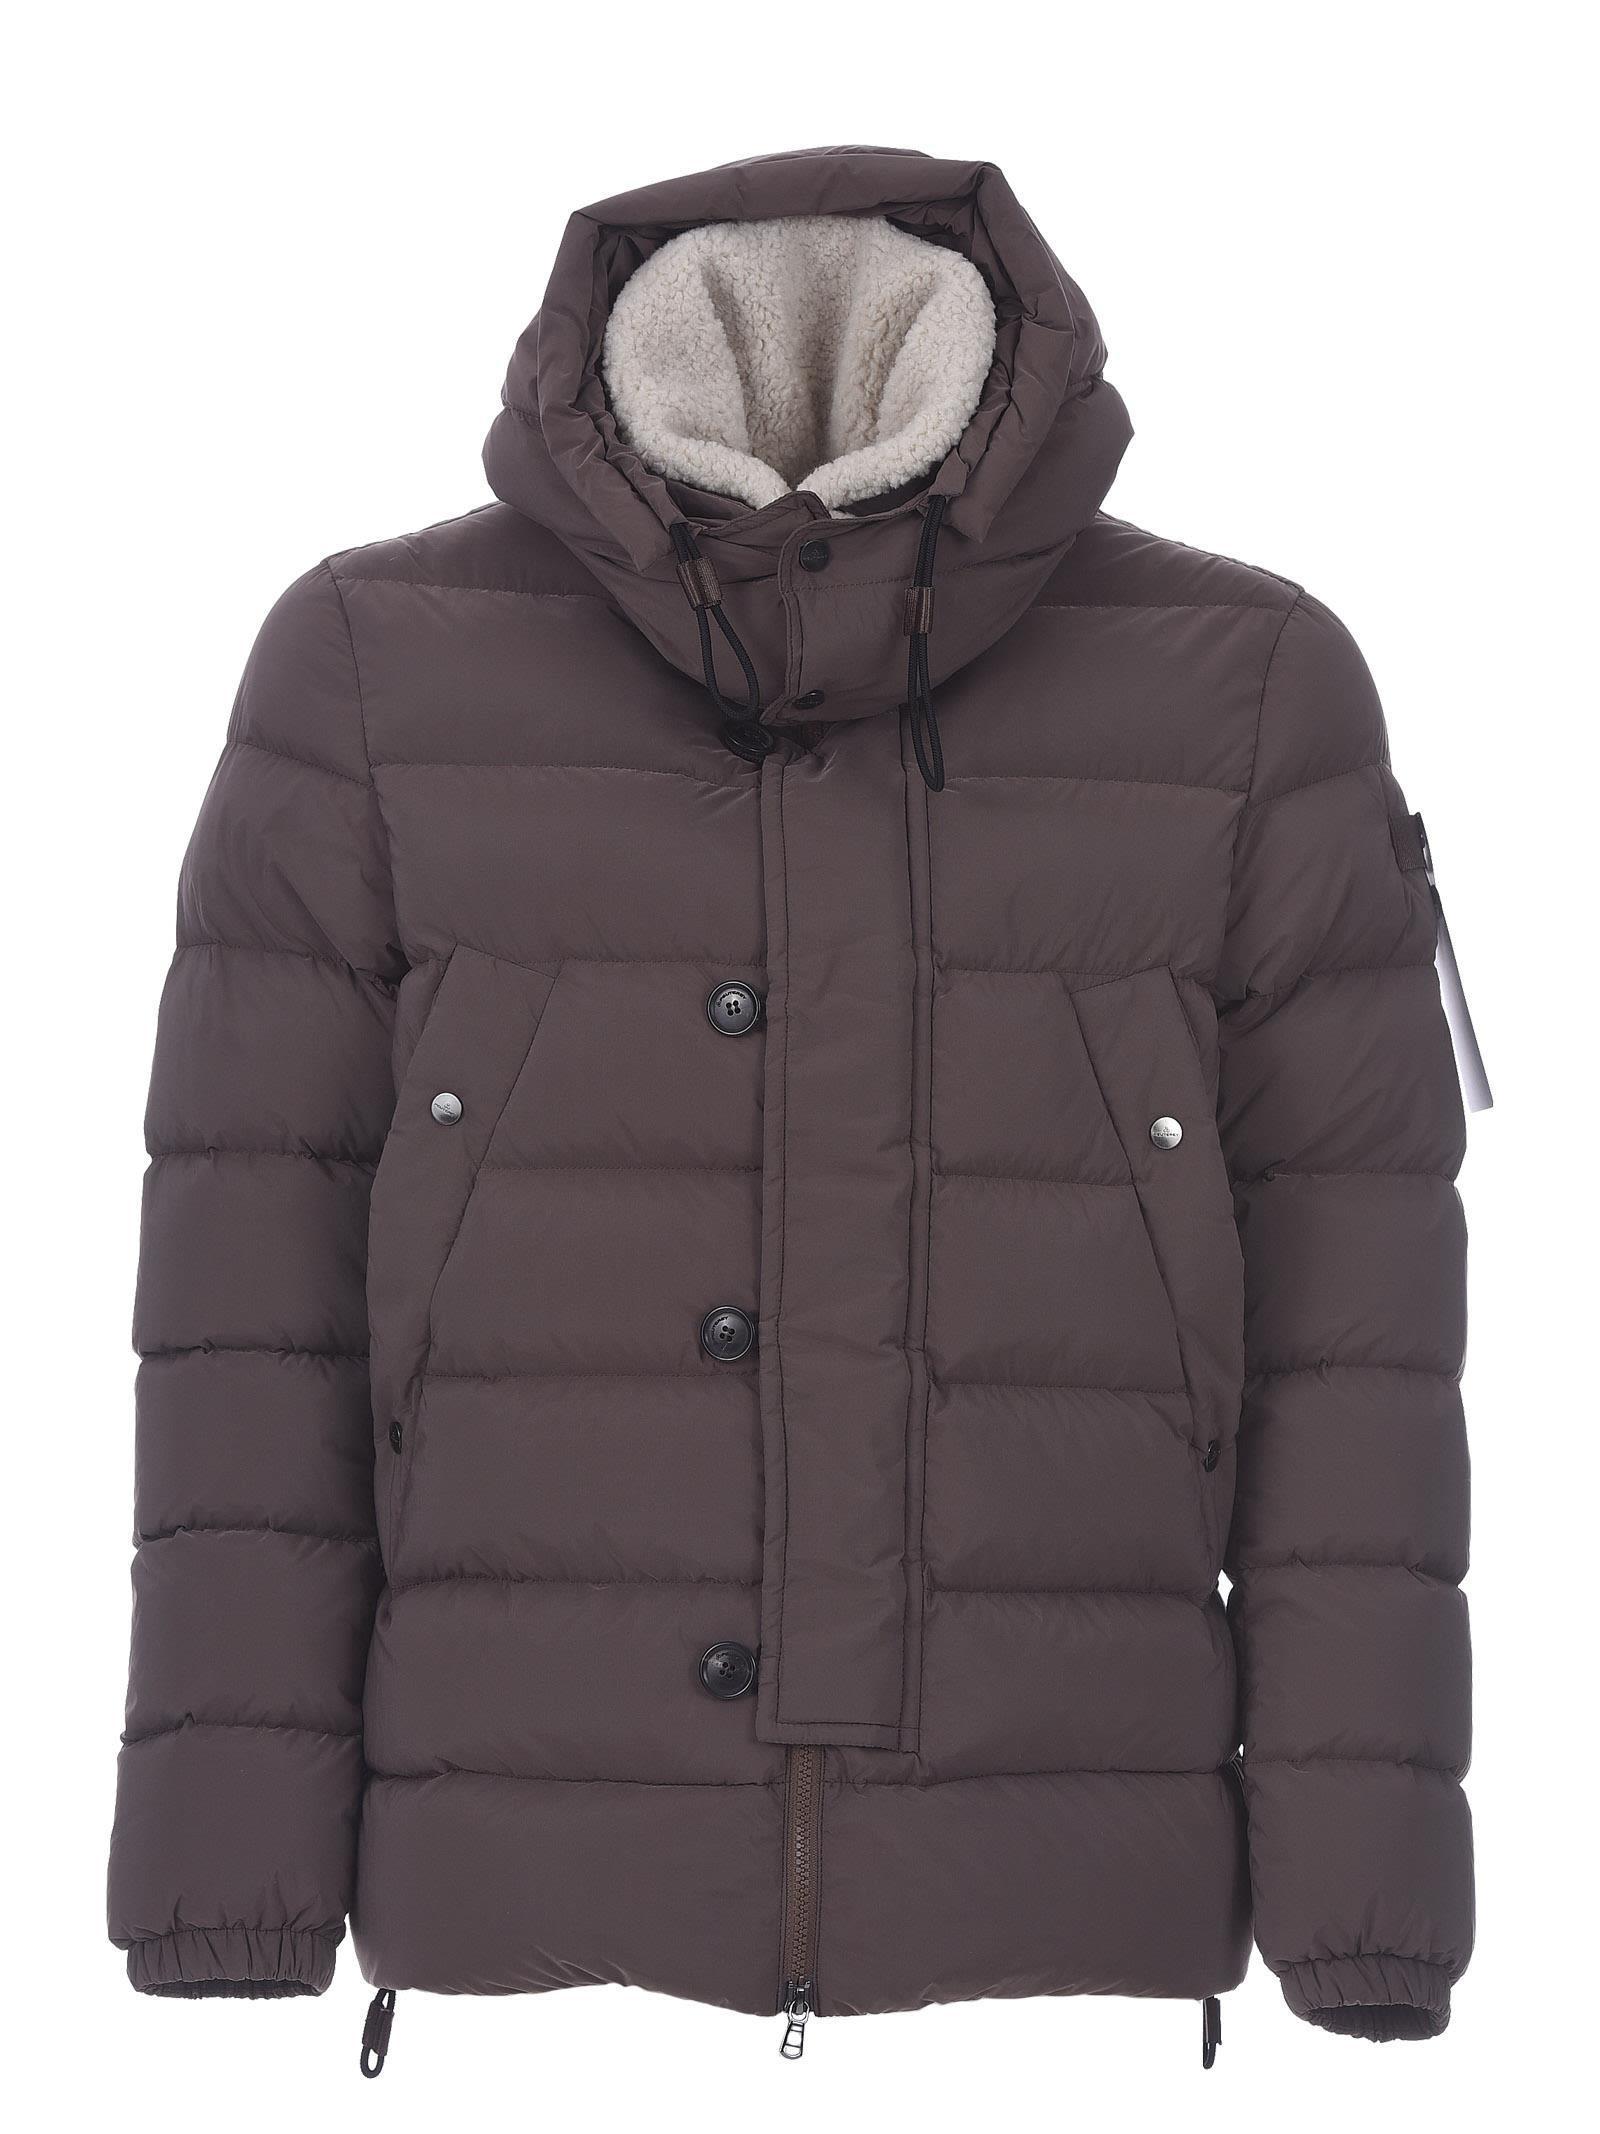 Peuterey Down Jacket Gripen Eco Fur In Marrone